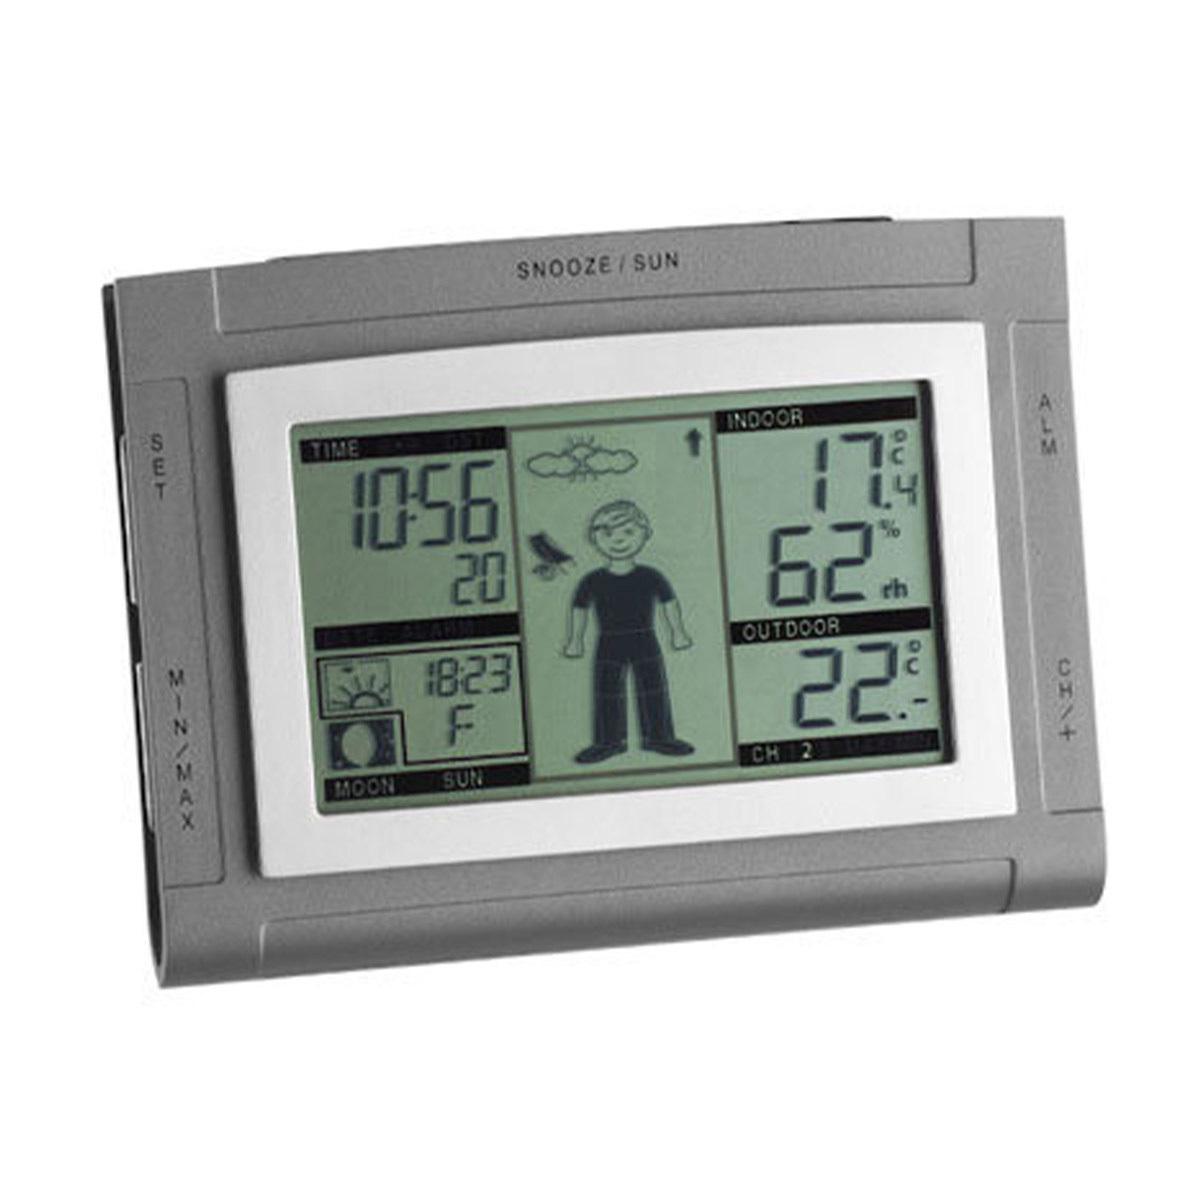 35-1064-10-50-it-funk-wetterstation-mit-wetterfigur-weather-boy-xs-1200x1200px.jpg